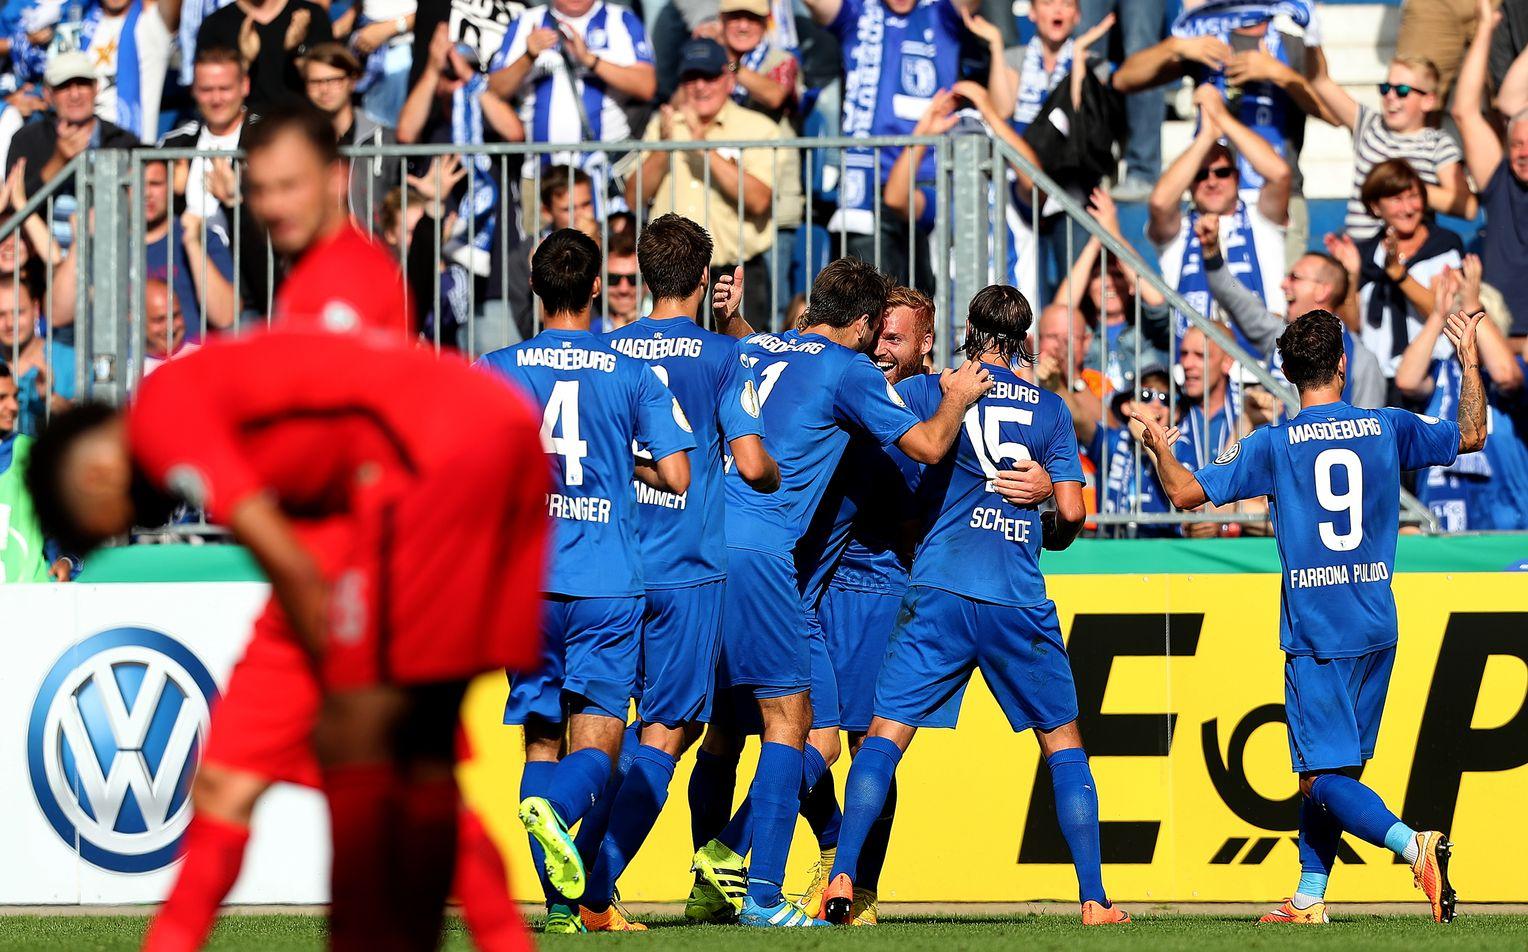 Magdeburg Gegen Frankfurt